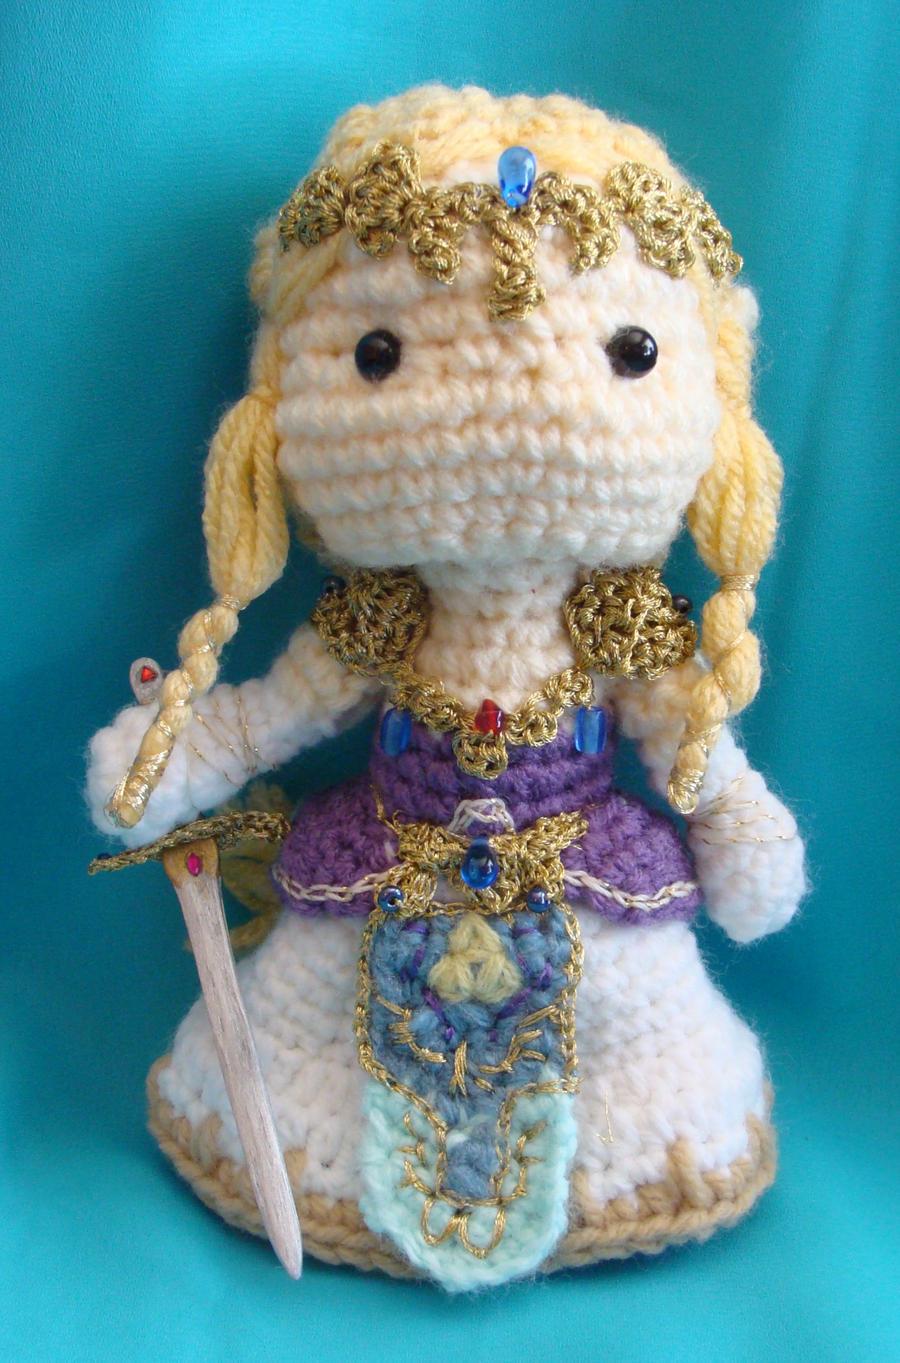 Amigurumi Magic Doll : Zelda amigurumi doll by Dragonlady92768 on DeviantArt